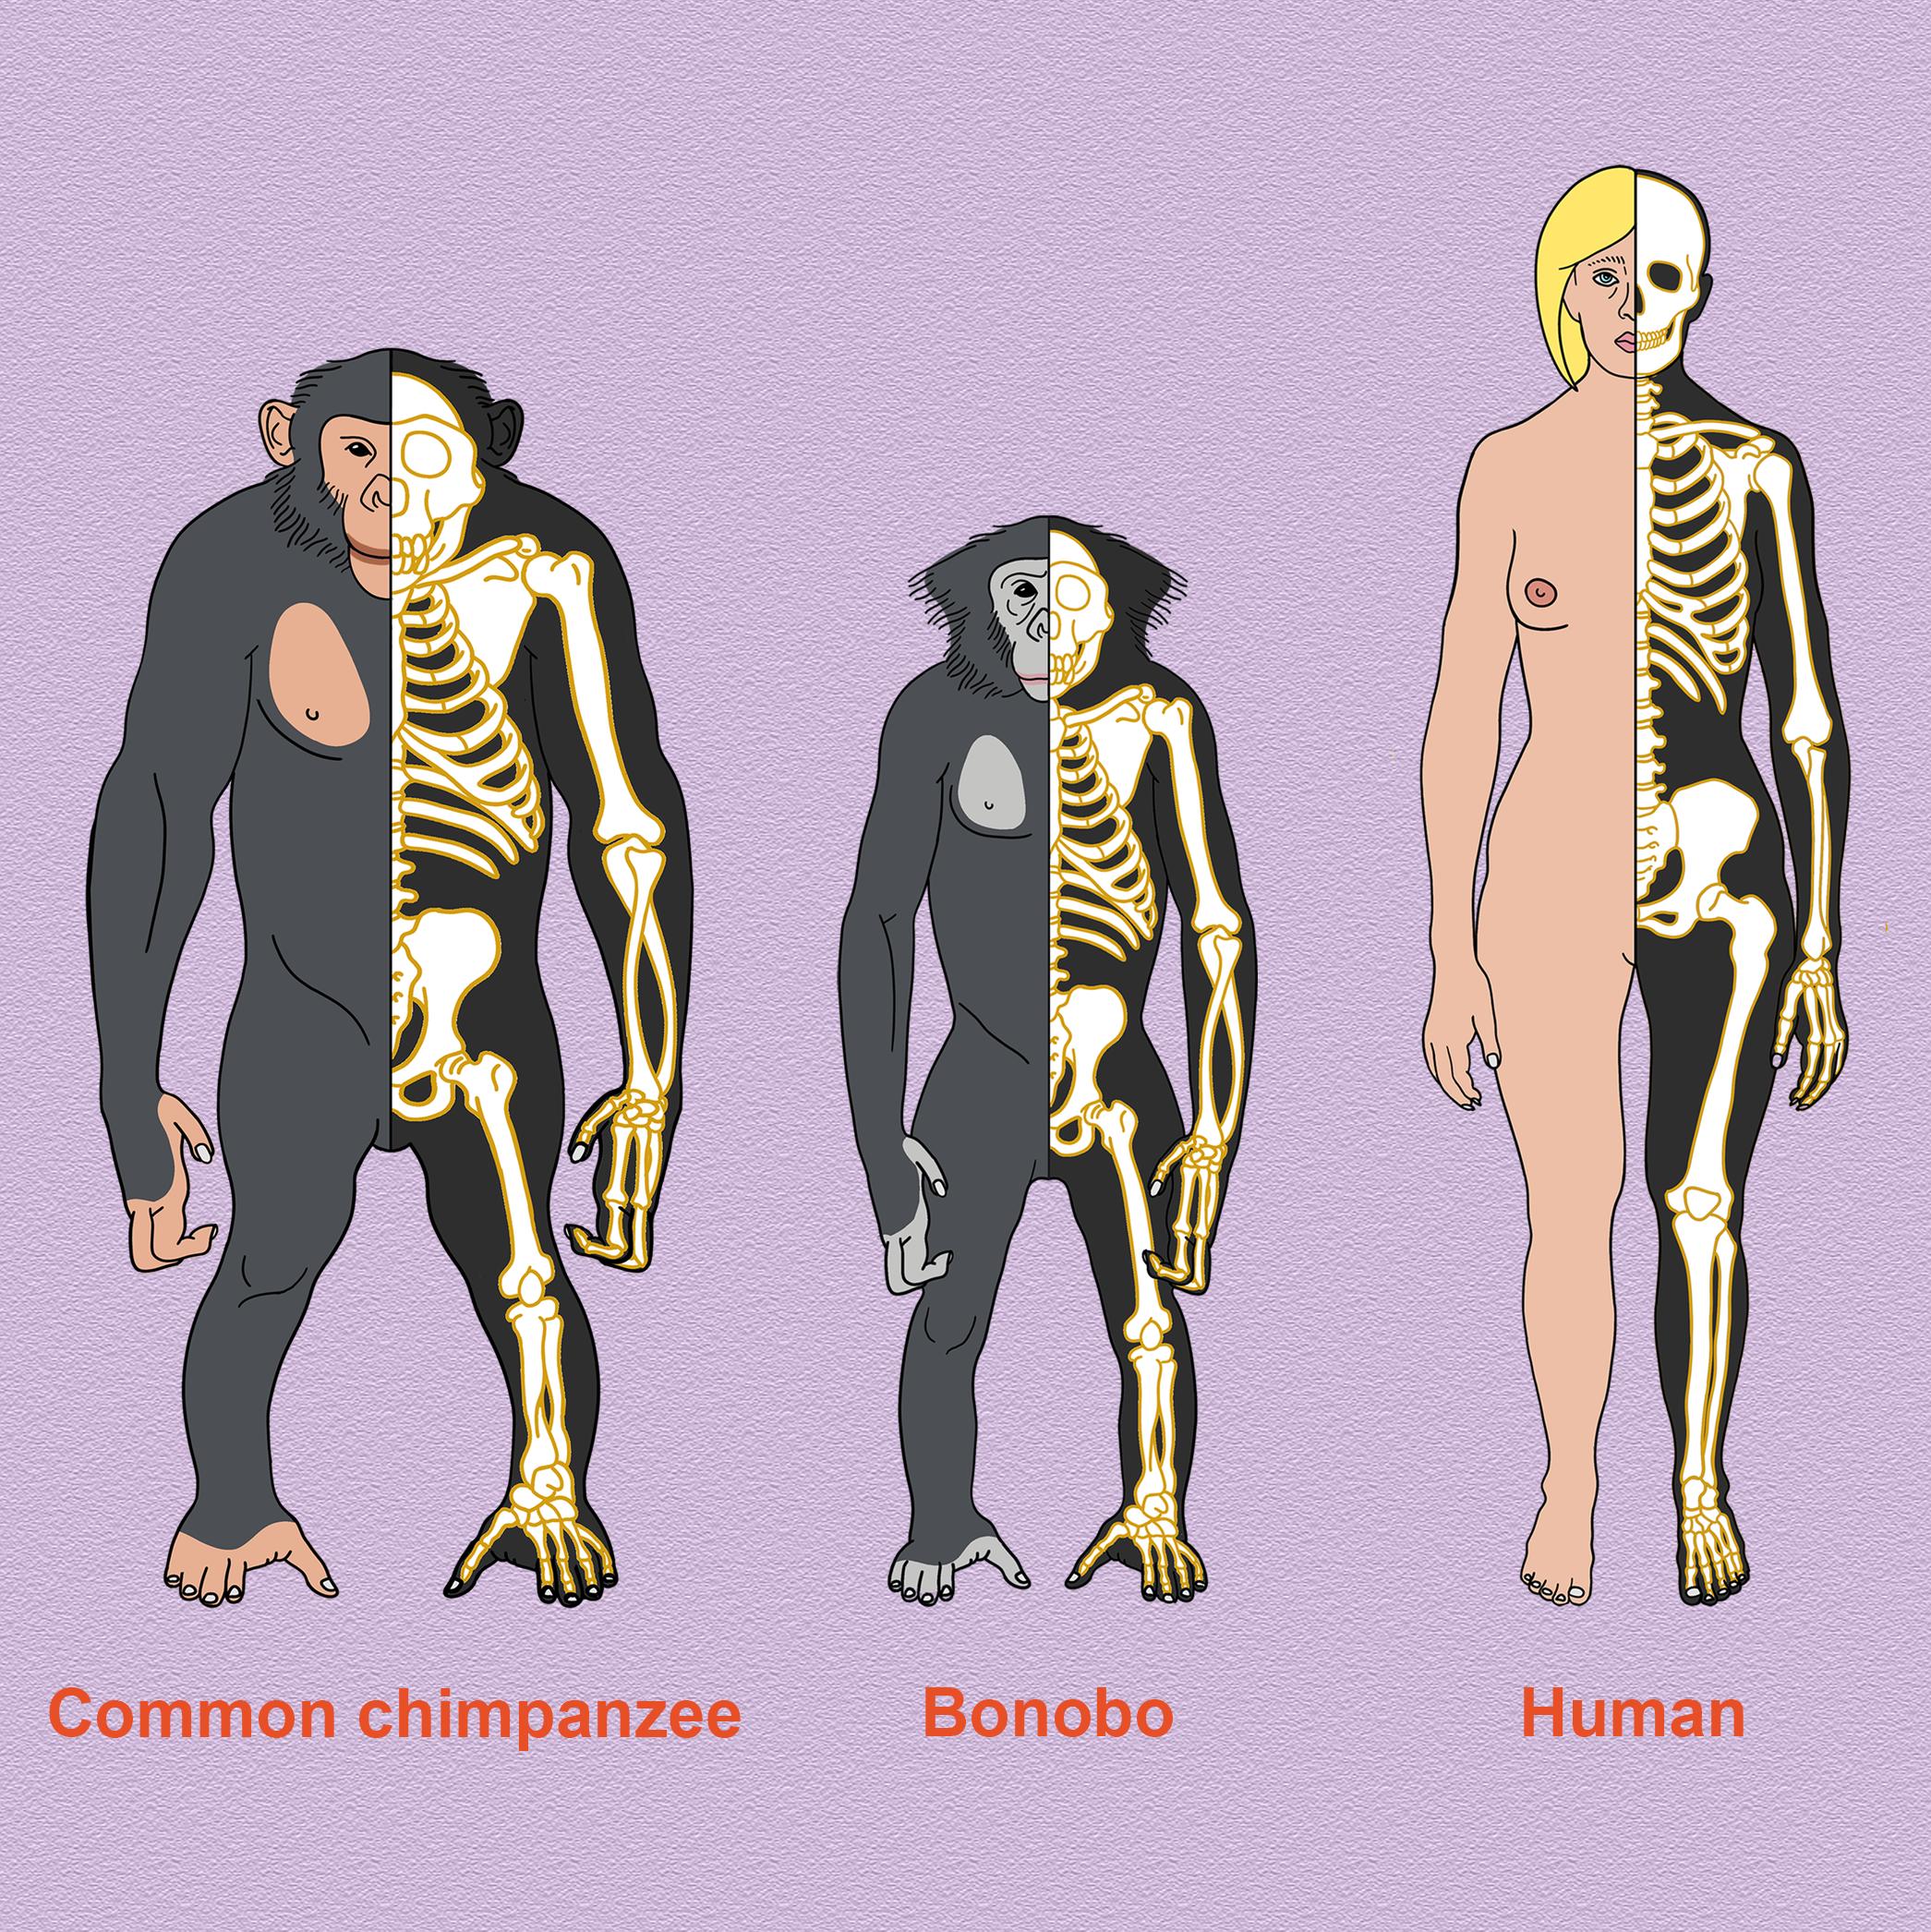 Chimp bonobo human standalone square.png